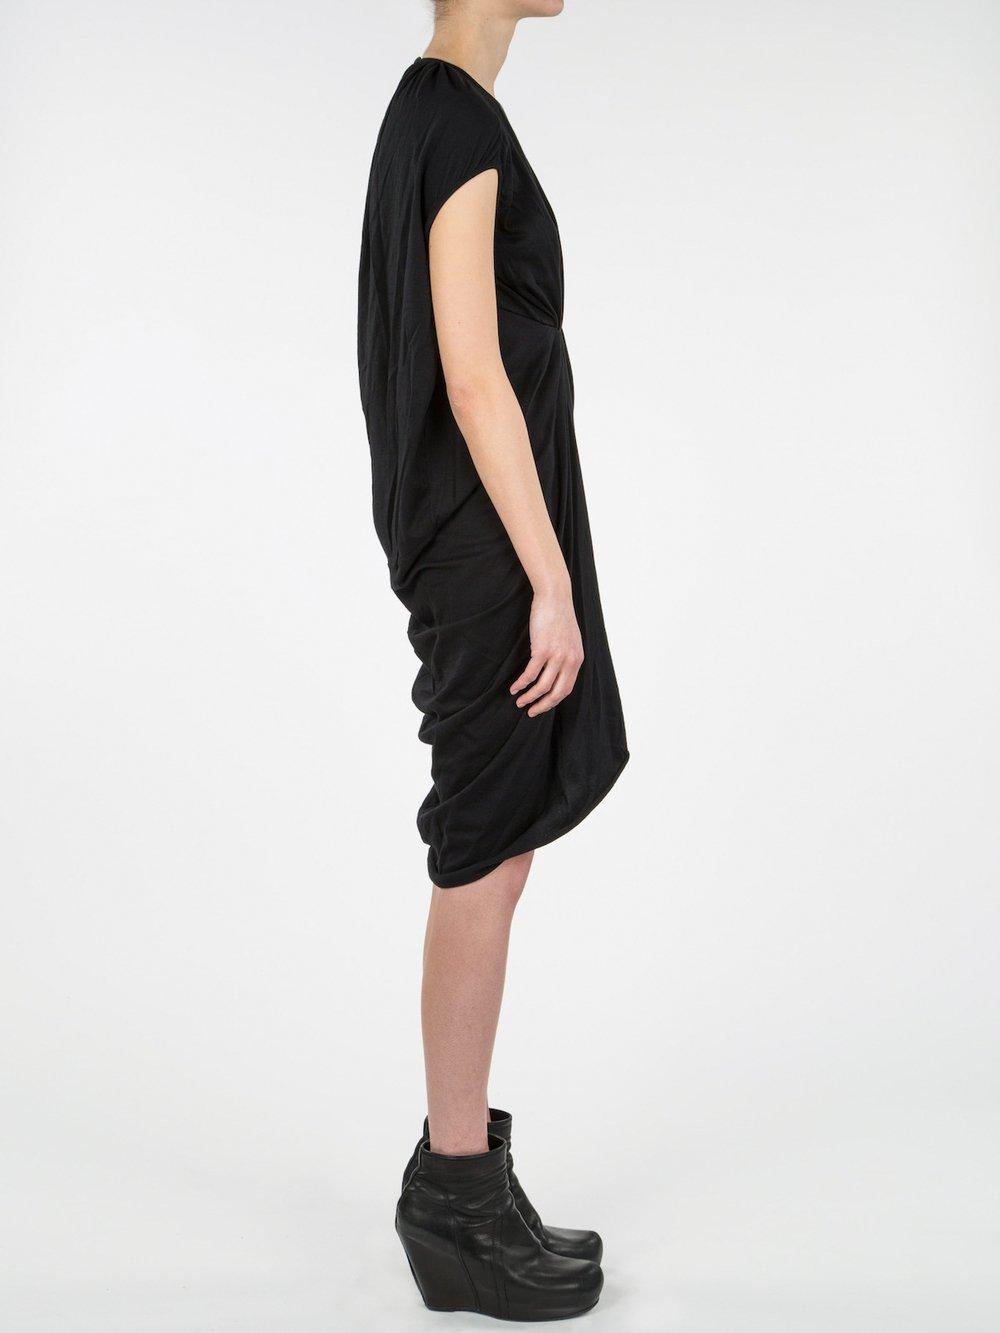 RICK OWENS LILIES - LOBSTER DRESS